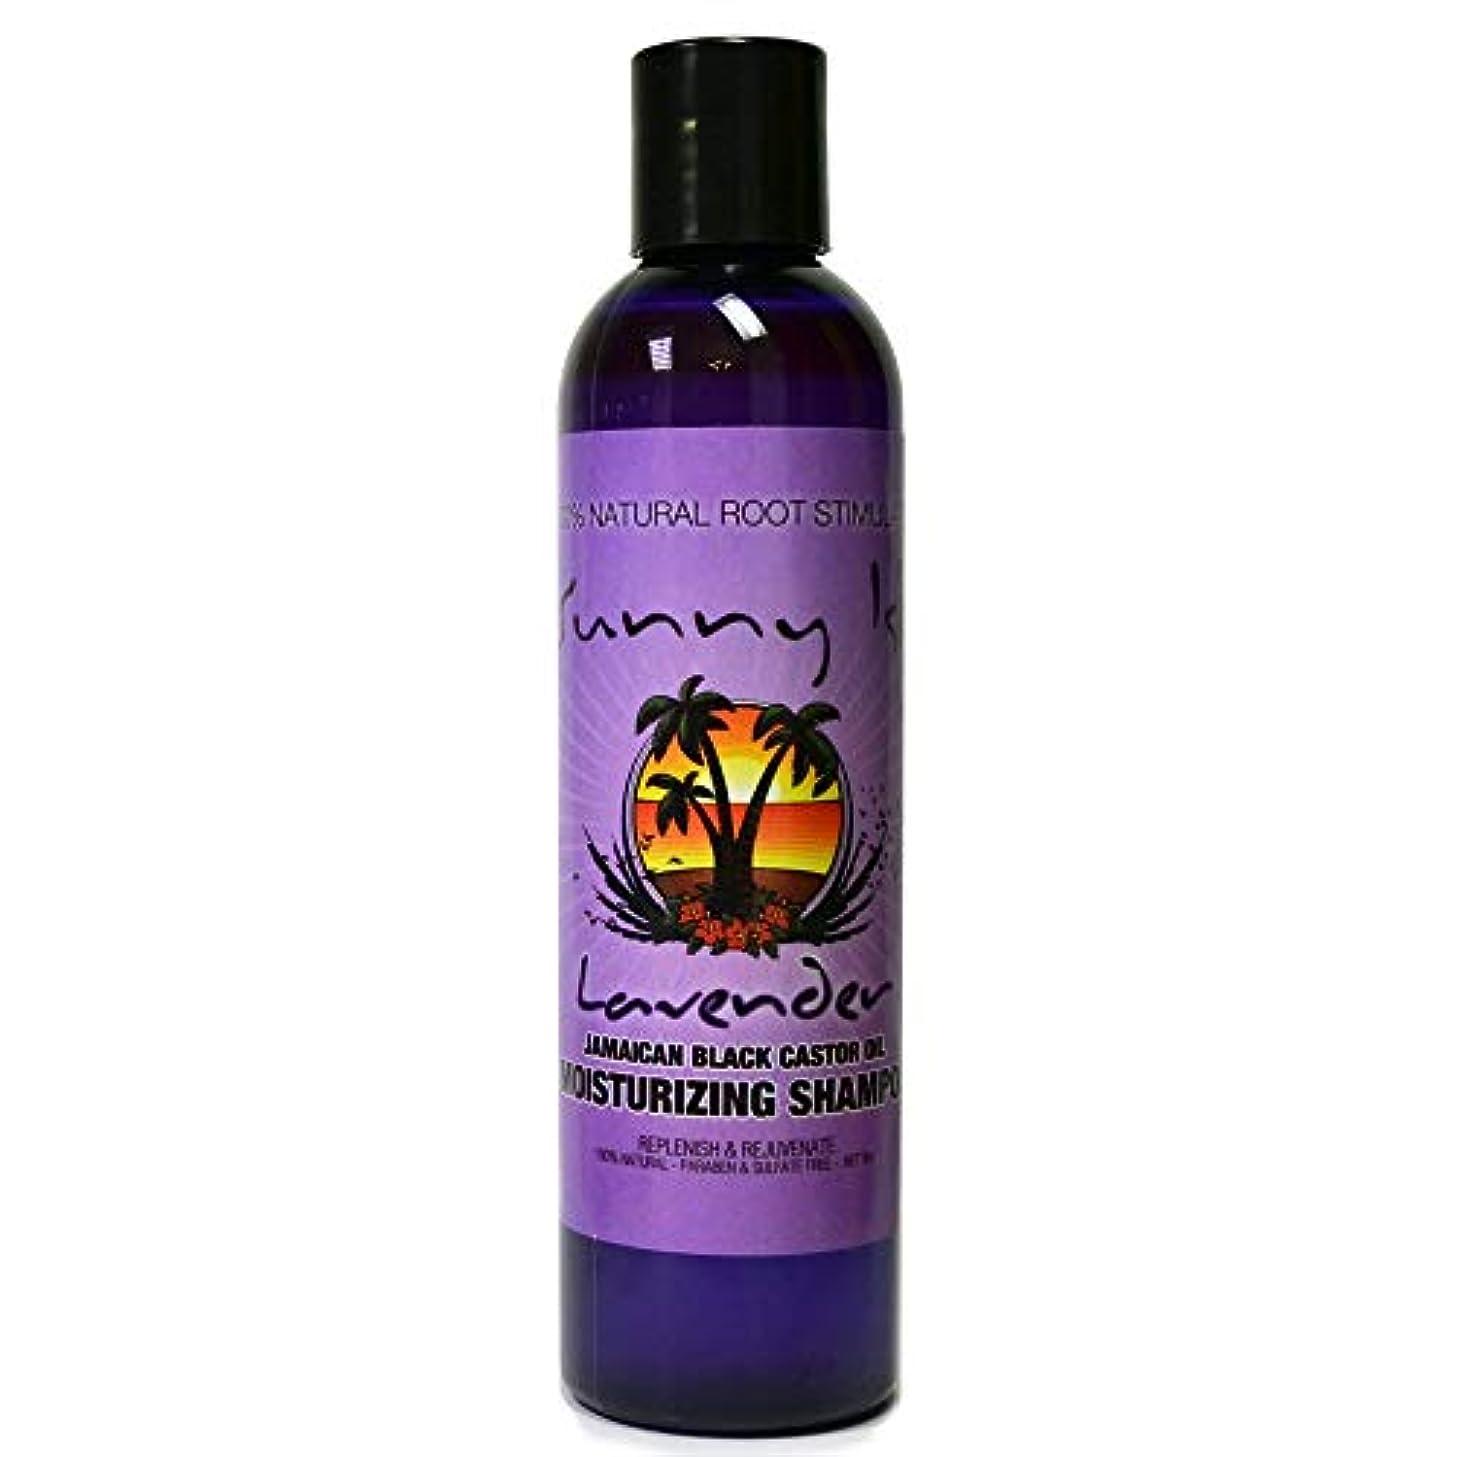 Sunny Isle Jamaican Black Castor Oil サニー島 - ジャマイカブラックヒマシ油モイスチャライジングコンディショナーラベンダー - 8オンスクリアランス価格 8オンス